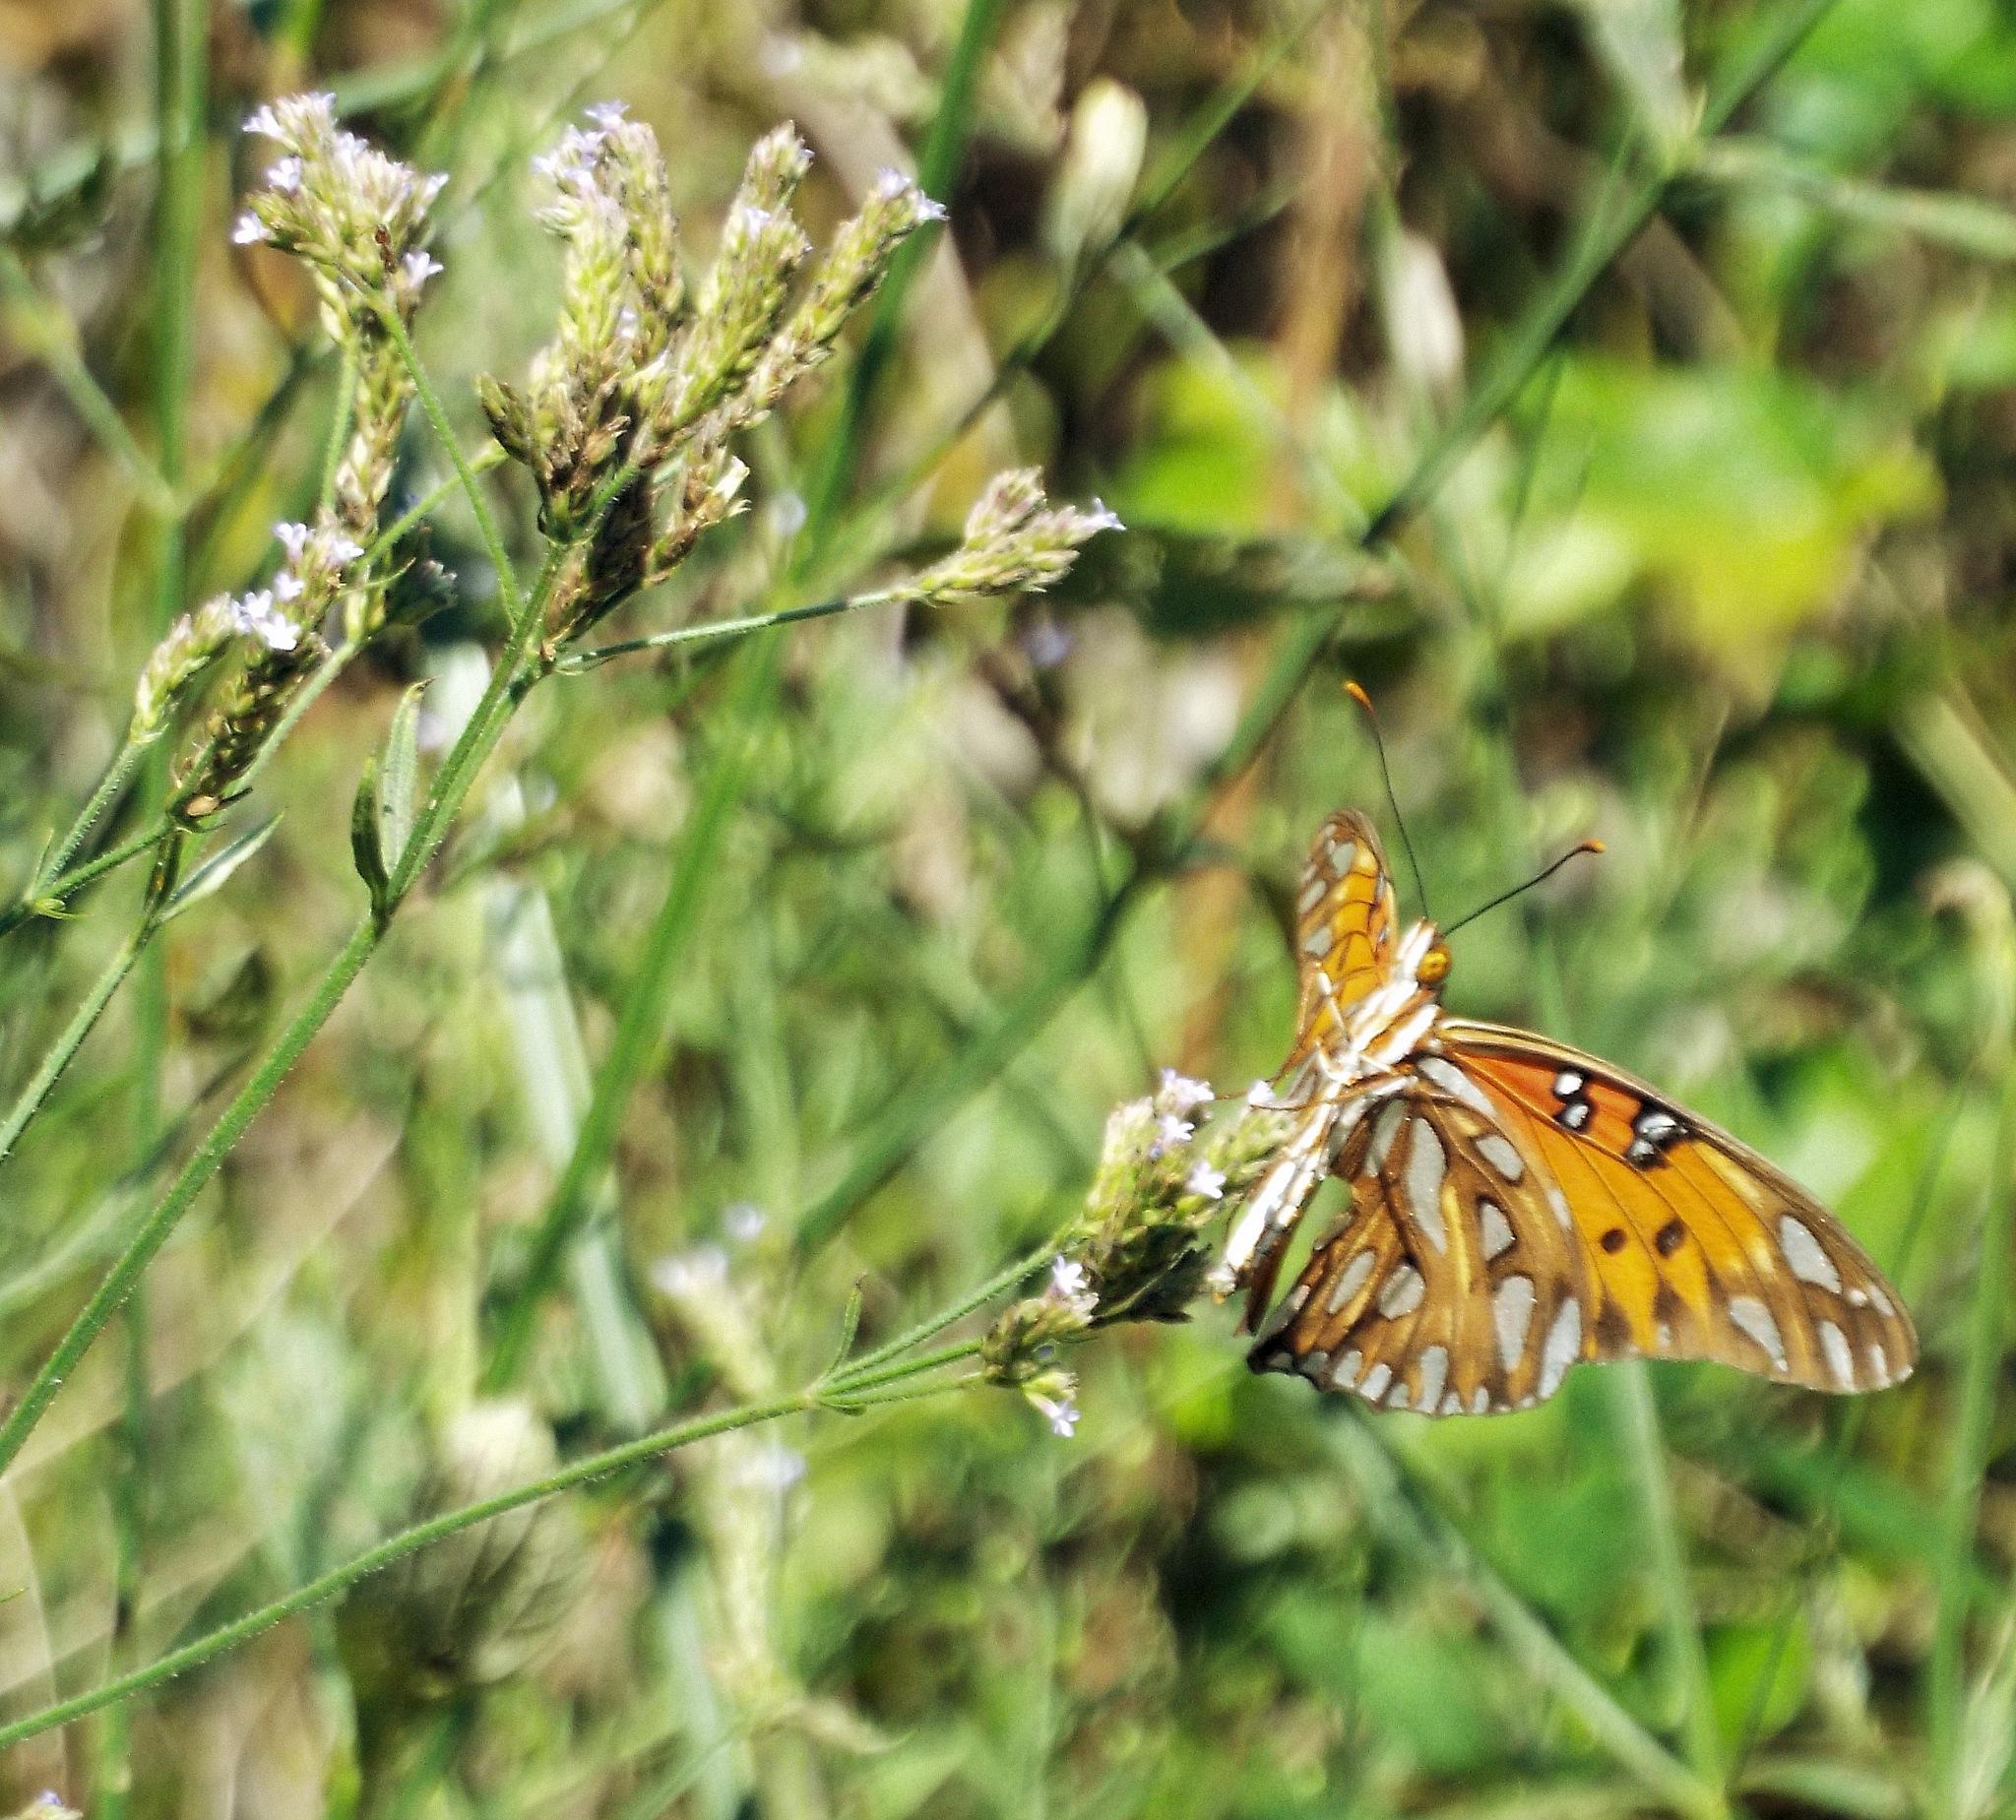 Gulf Fritillary Butterfly by Alex Ingram